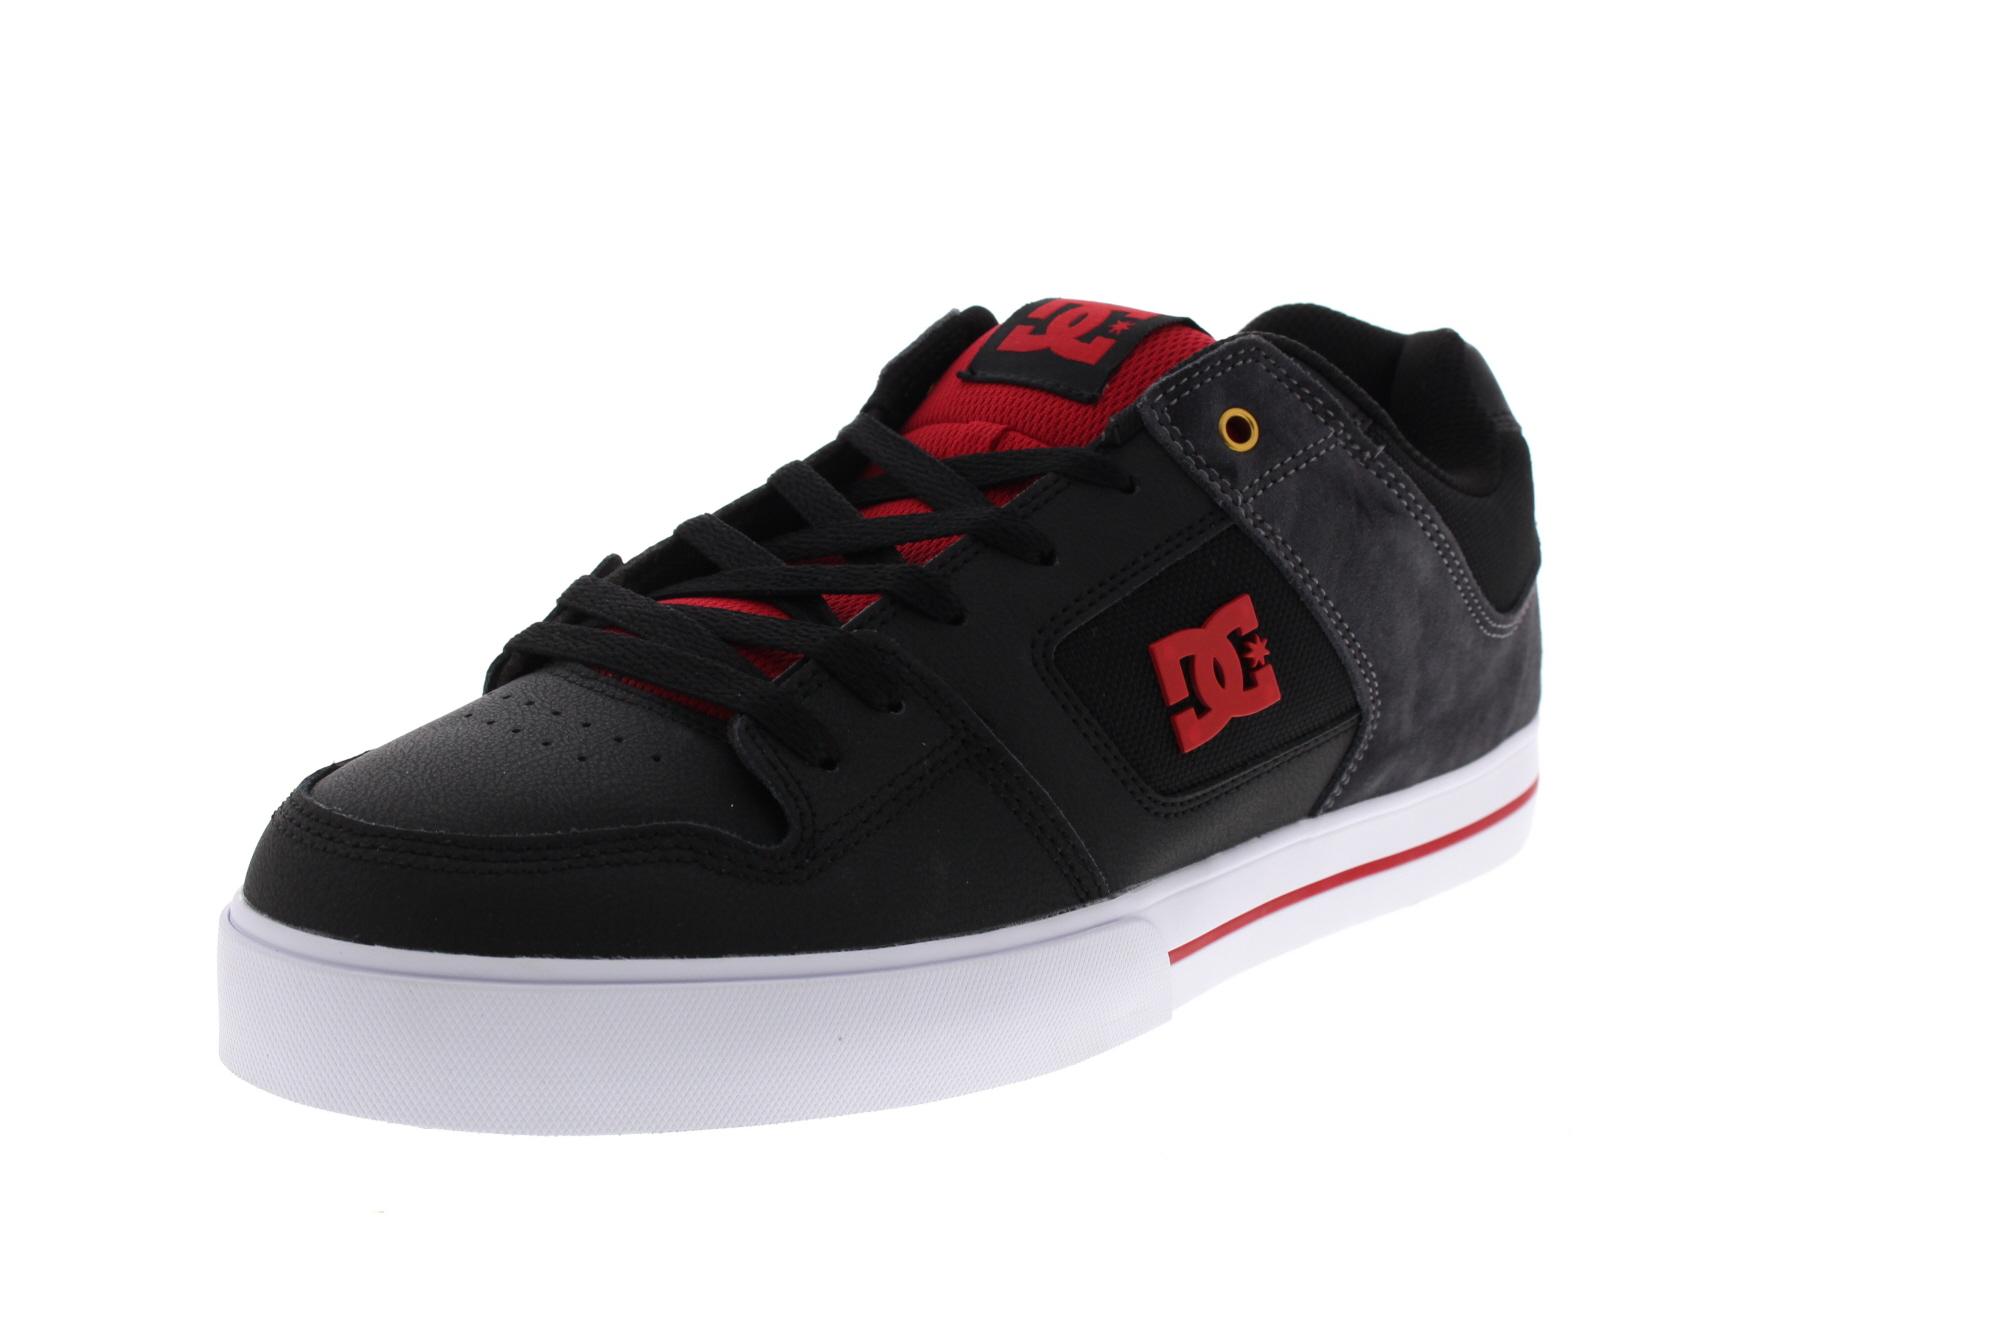 DC in Übergrößen - PURE SE 301024-BLR - black red